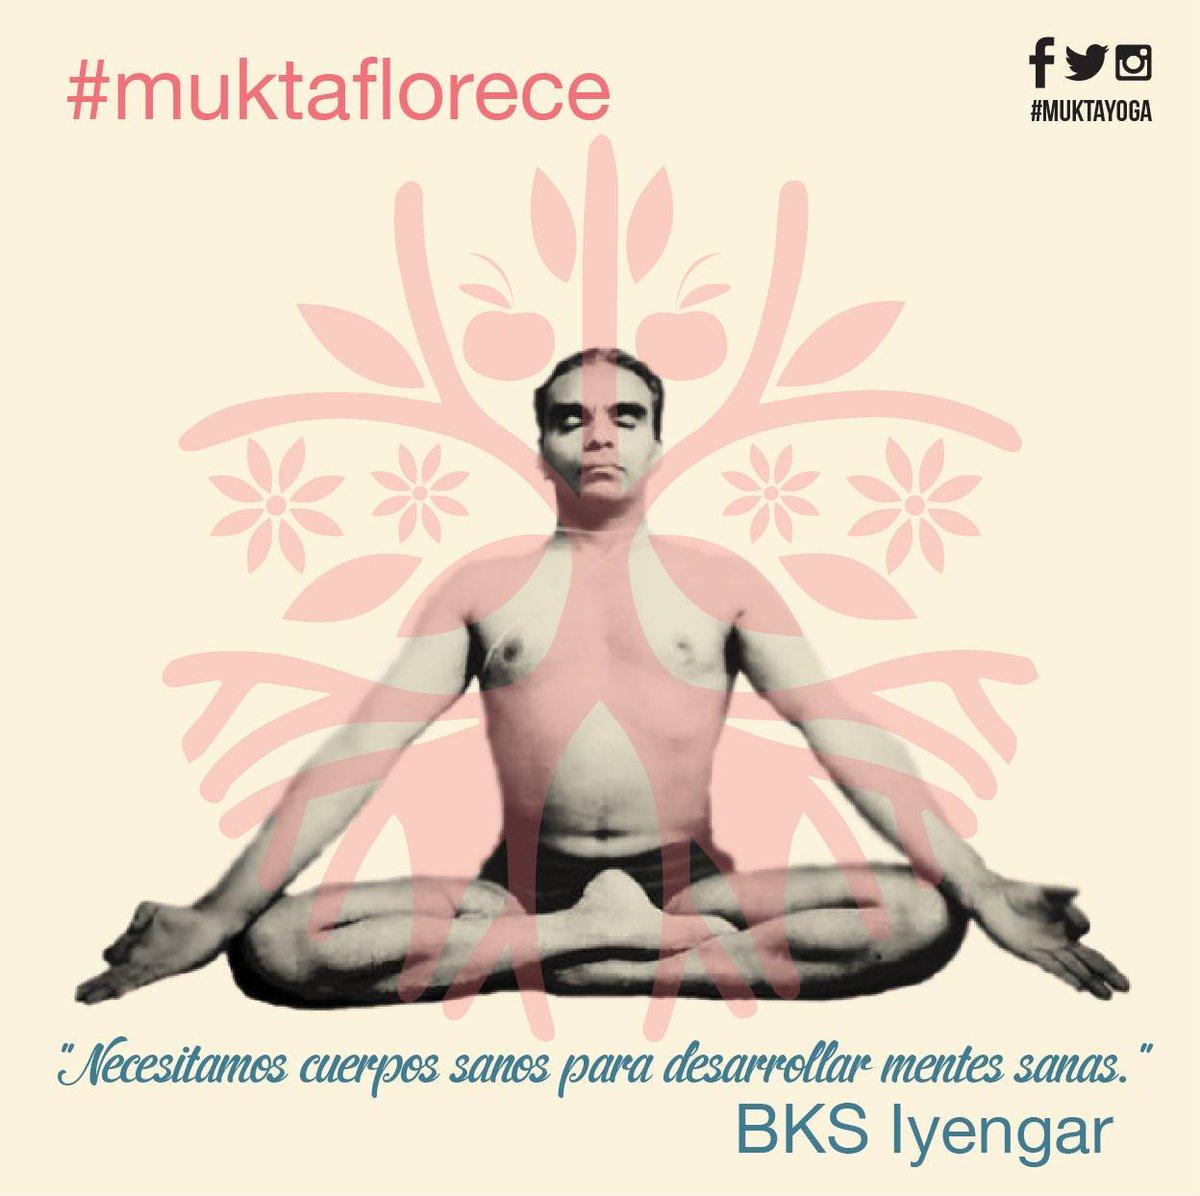 Mukta Yoga On Twitter Compartimos Una Frase Del Maestro